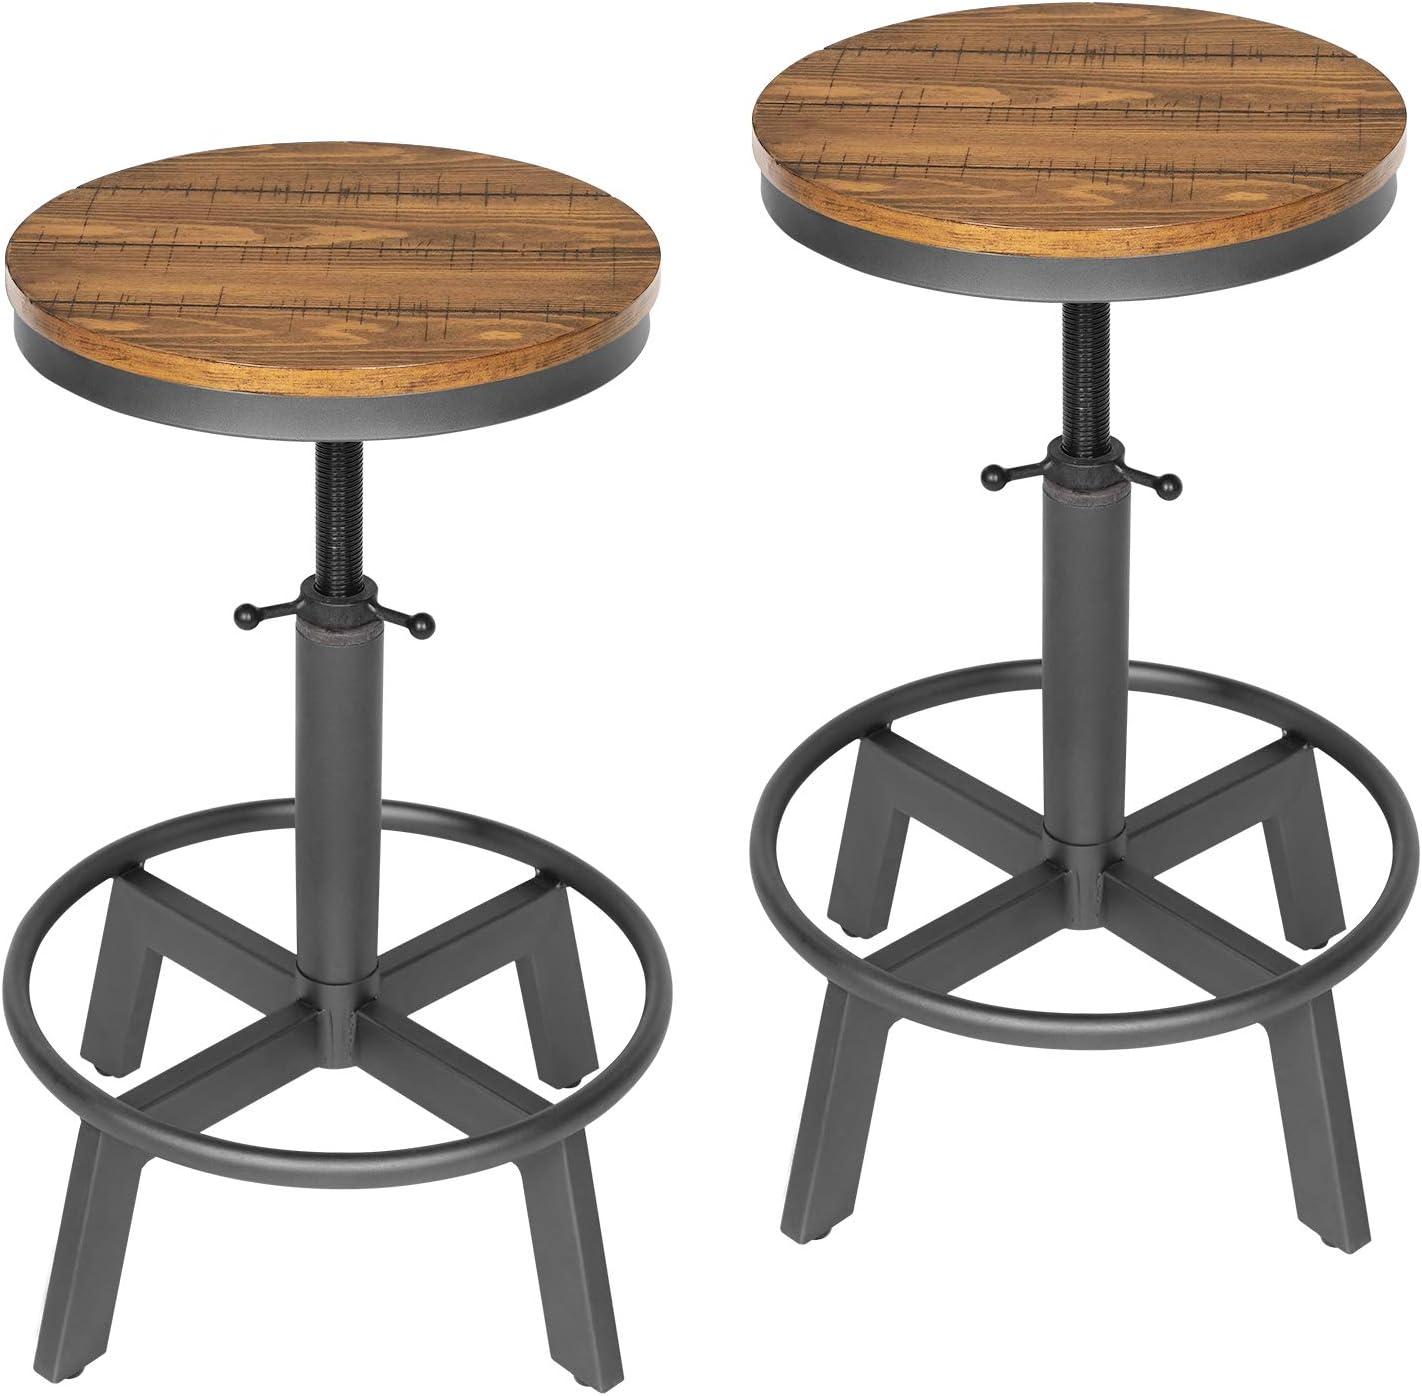 KATDANS Rustic Swivel Bar Stool-Counter Height Bar Stools - Set of 2-24